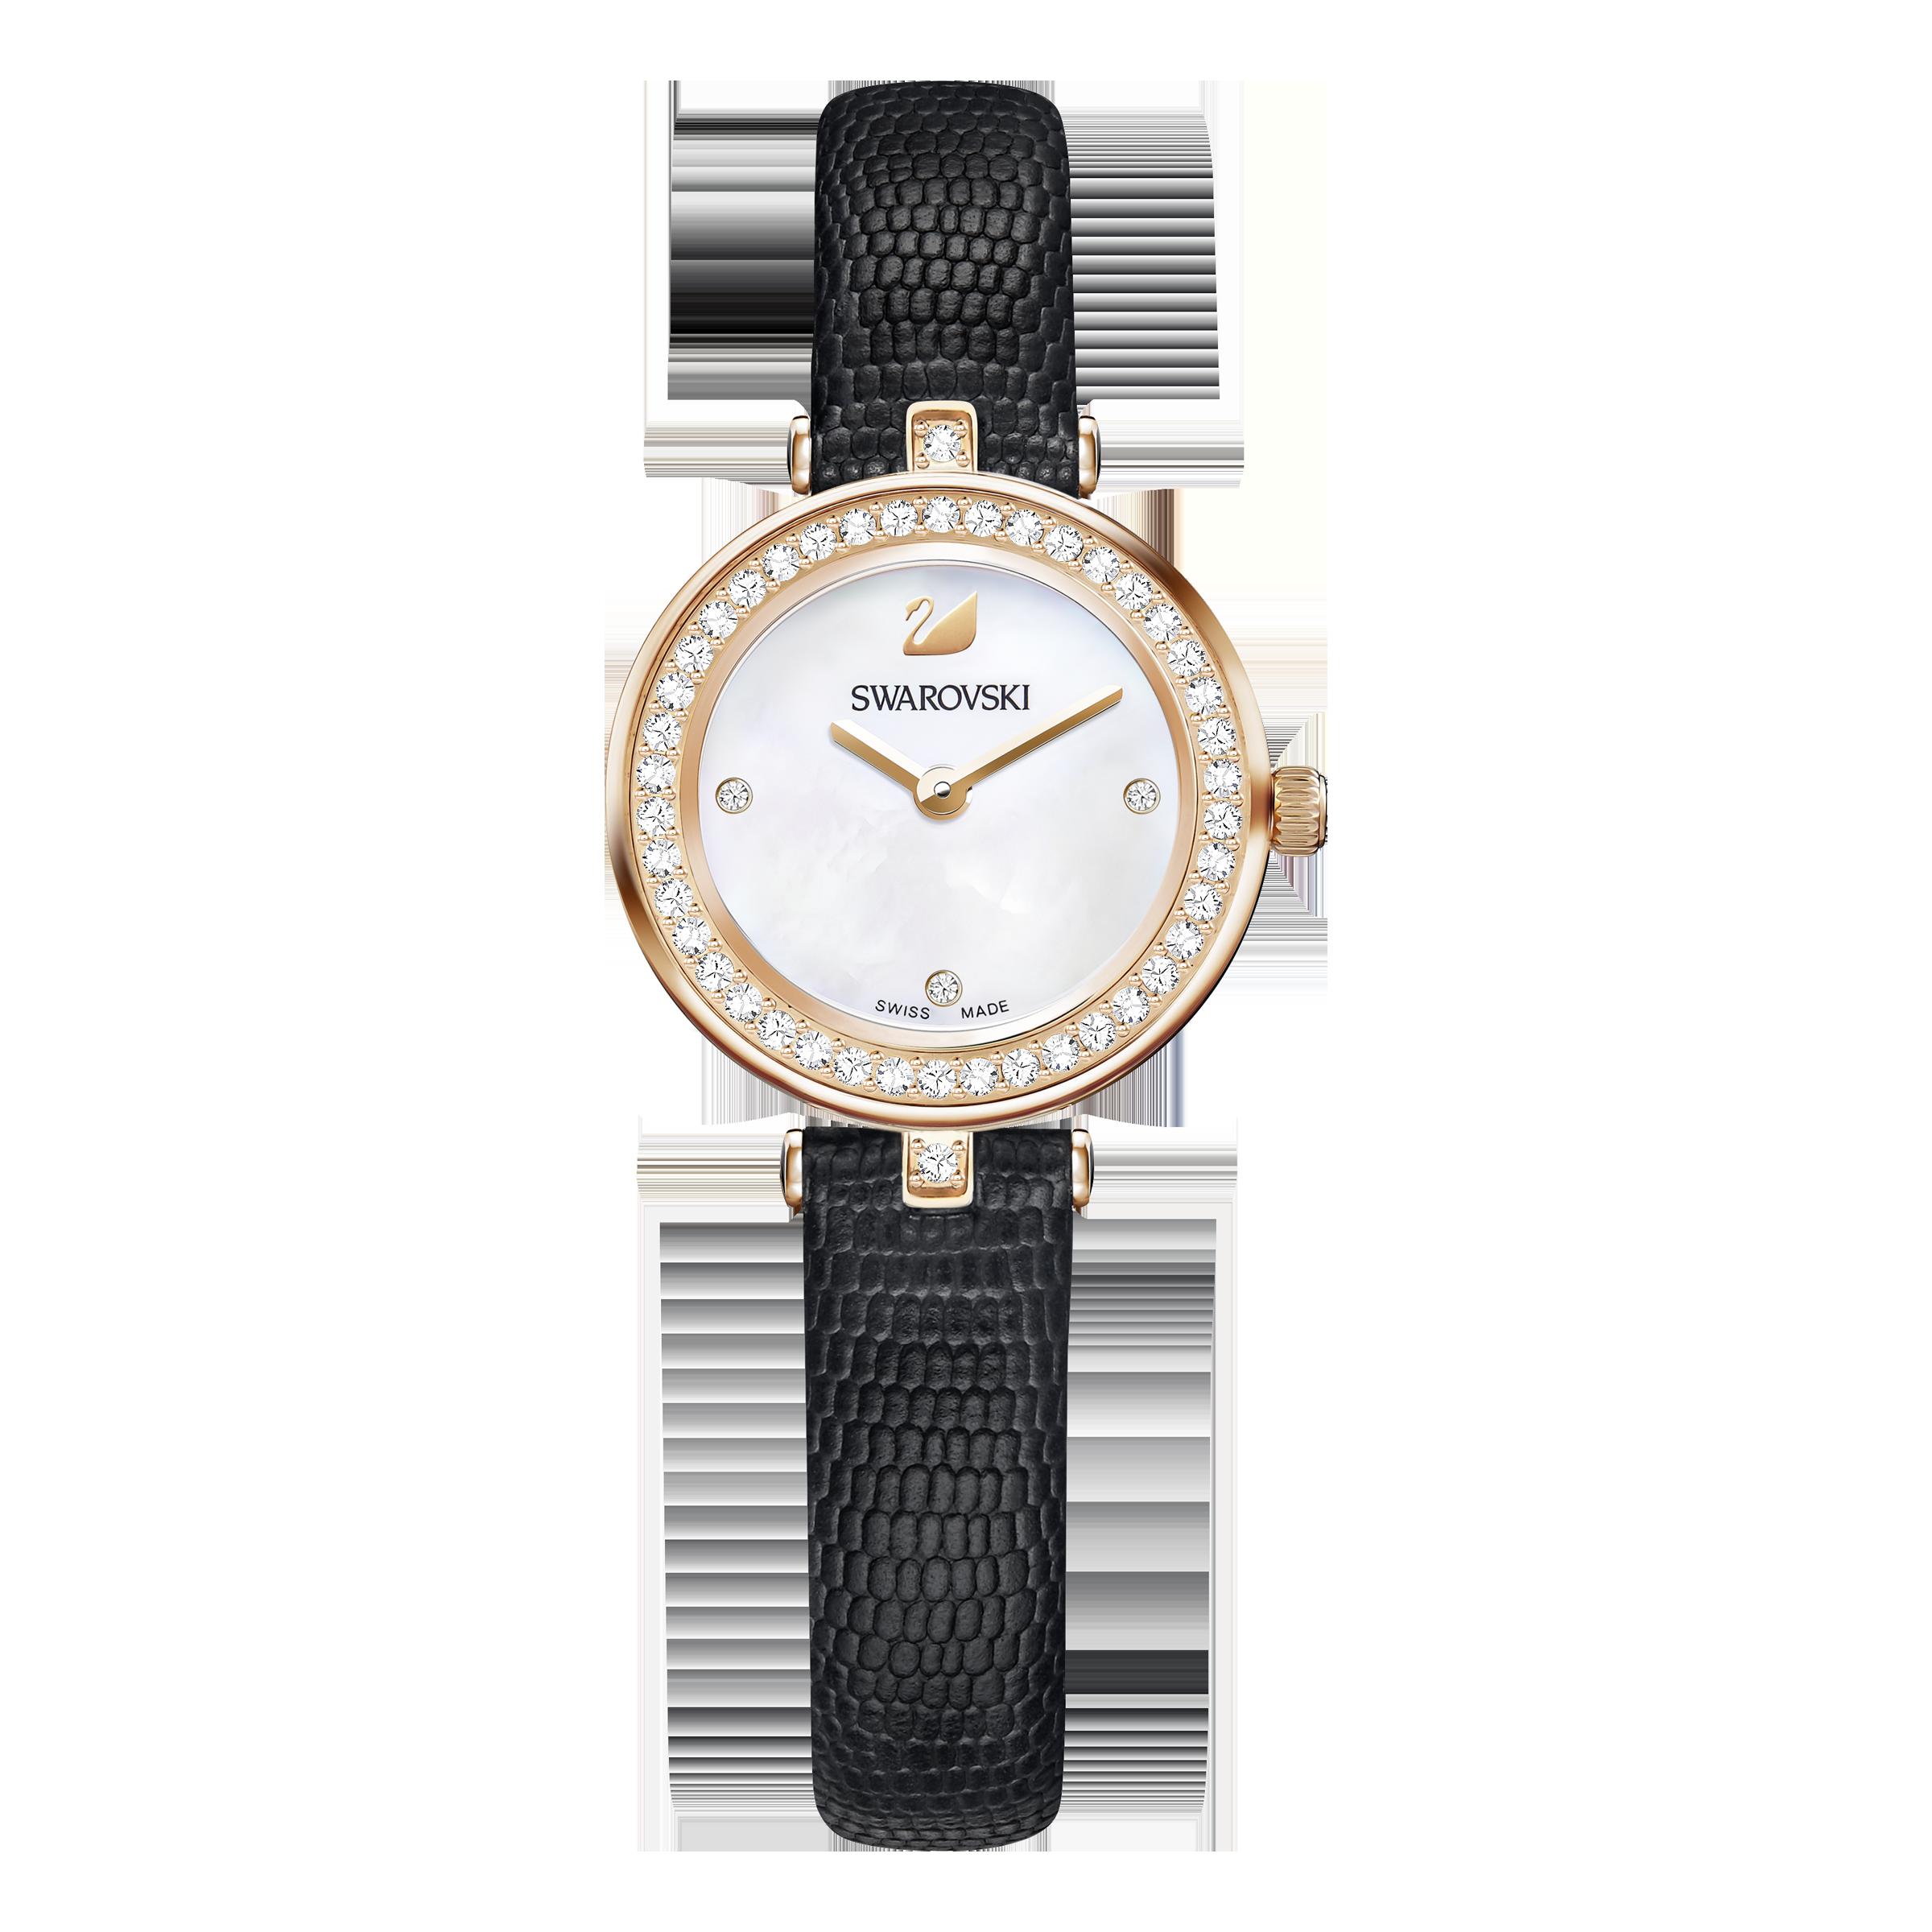 Aila Dressy Mini Watch, Leather strap, Black, Rose-gold tone PVD